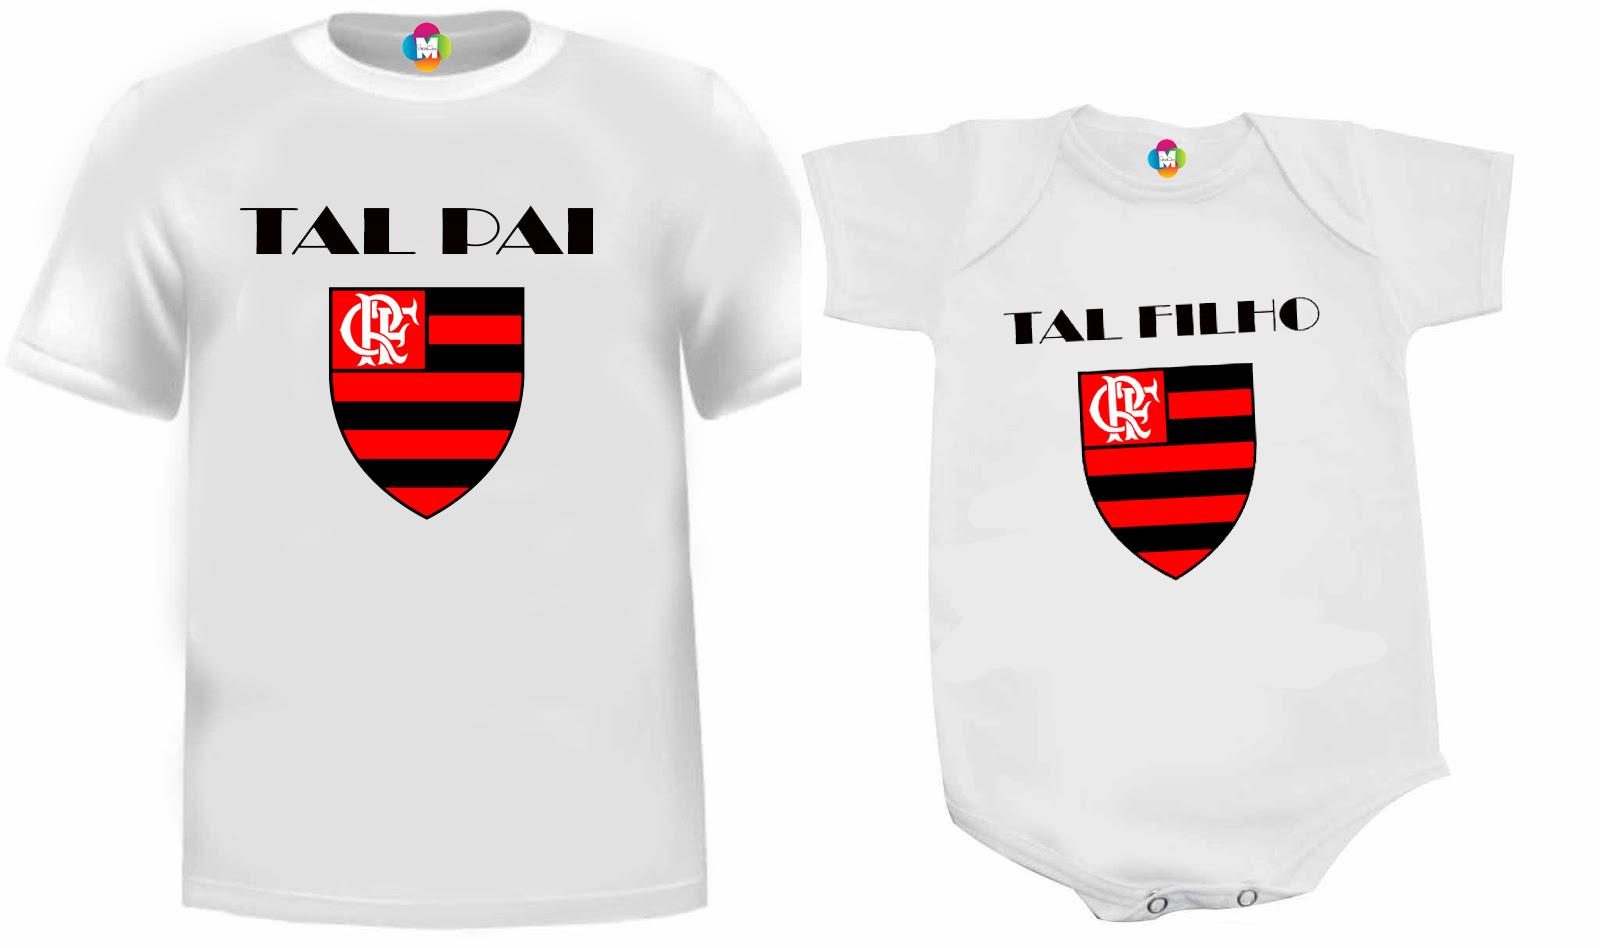 ca57121d2e Conjunto Tal Pai Tal Filho Joinville